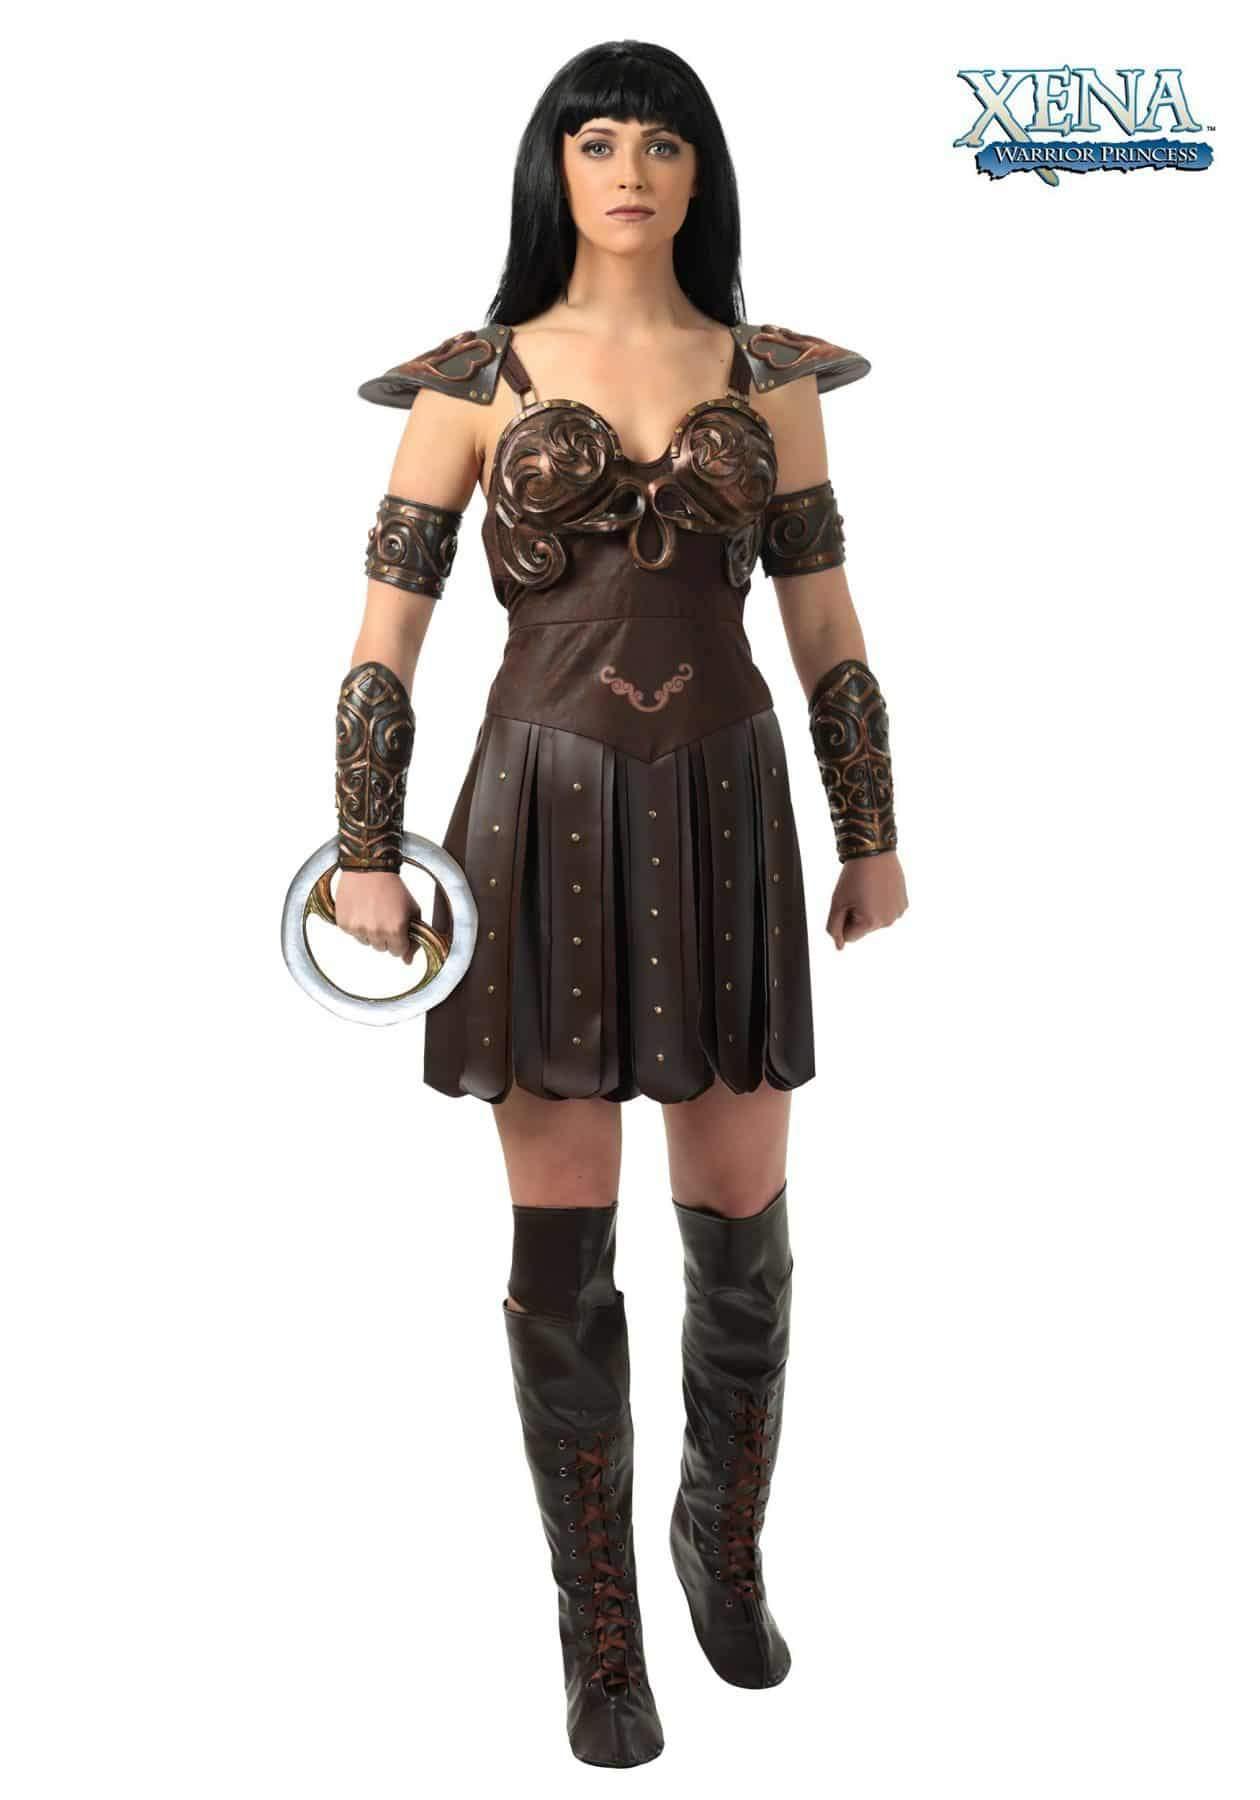 plus-size-womens-xena-costume